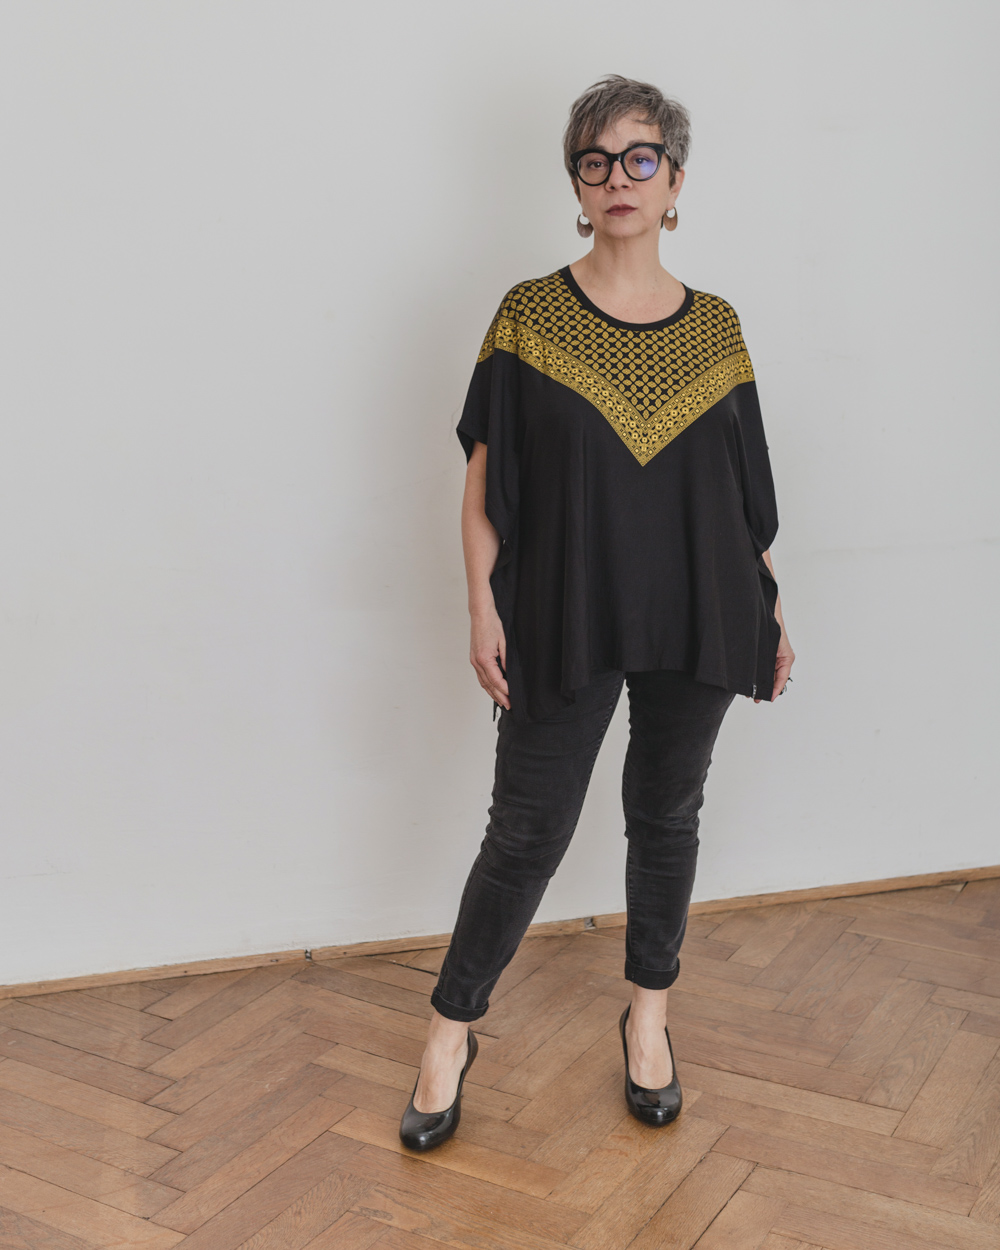 Angela Baghino - Dezen Dezen-9.jpg